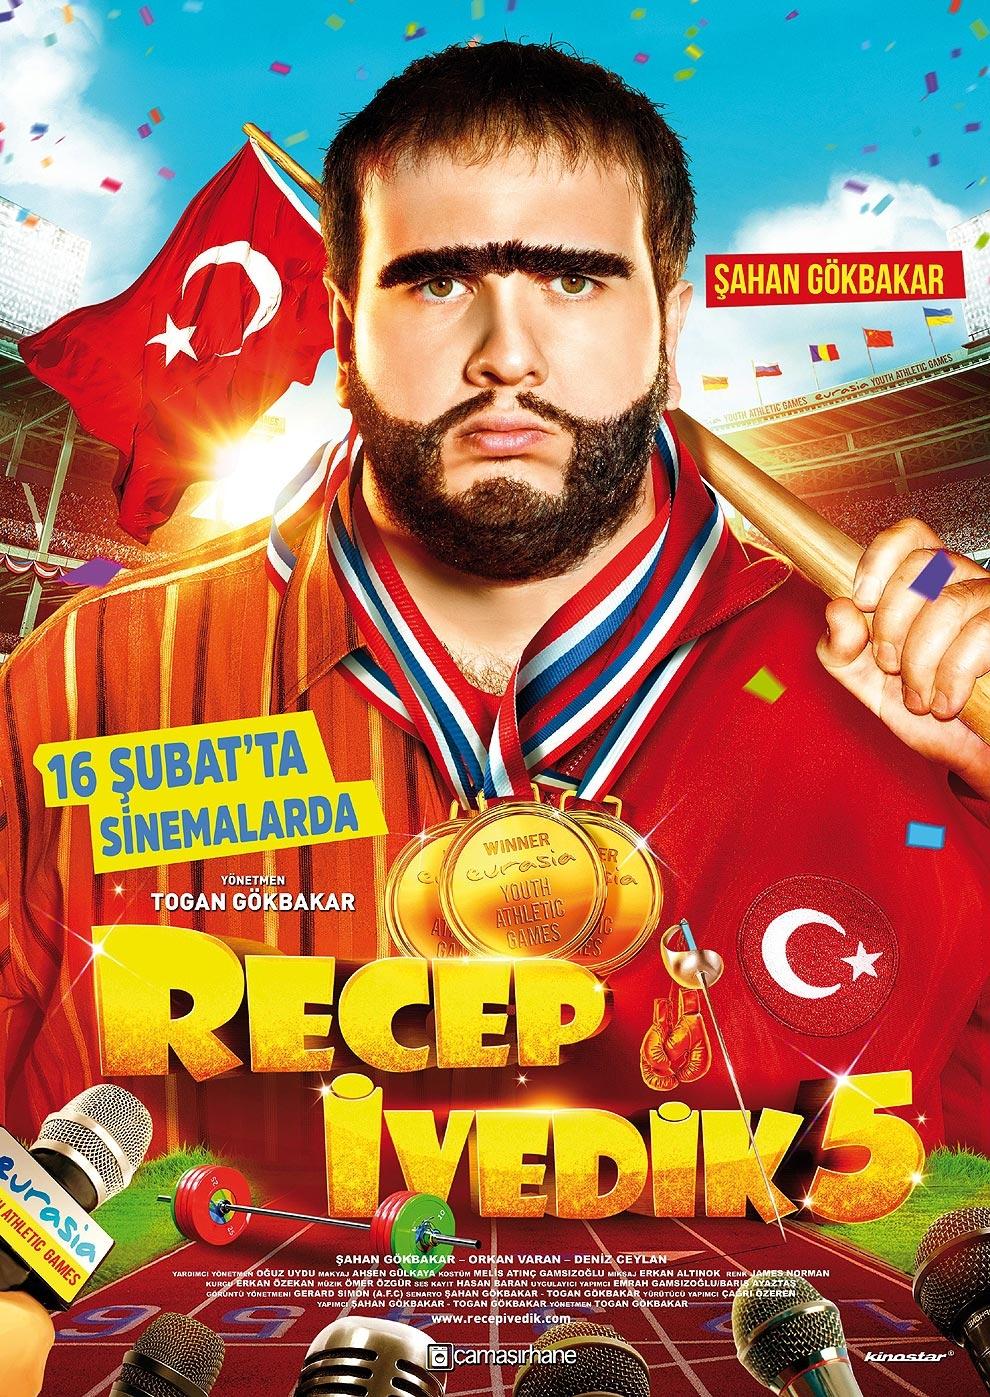 Recep Ivedik 5 (Poster)